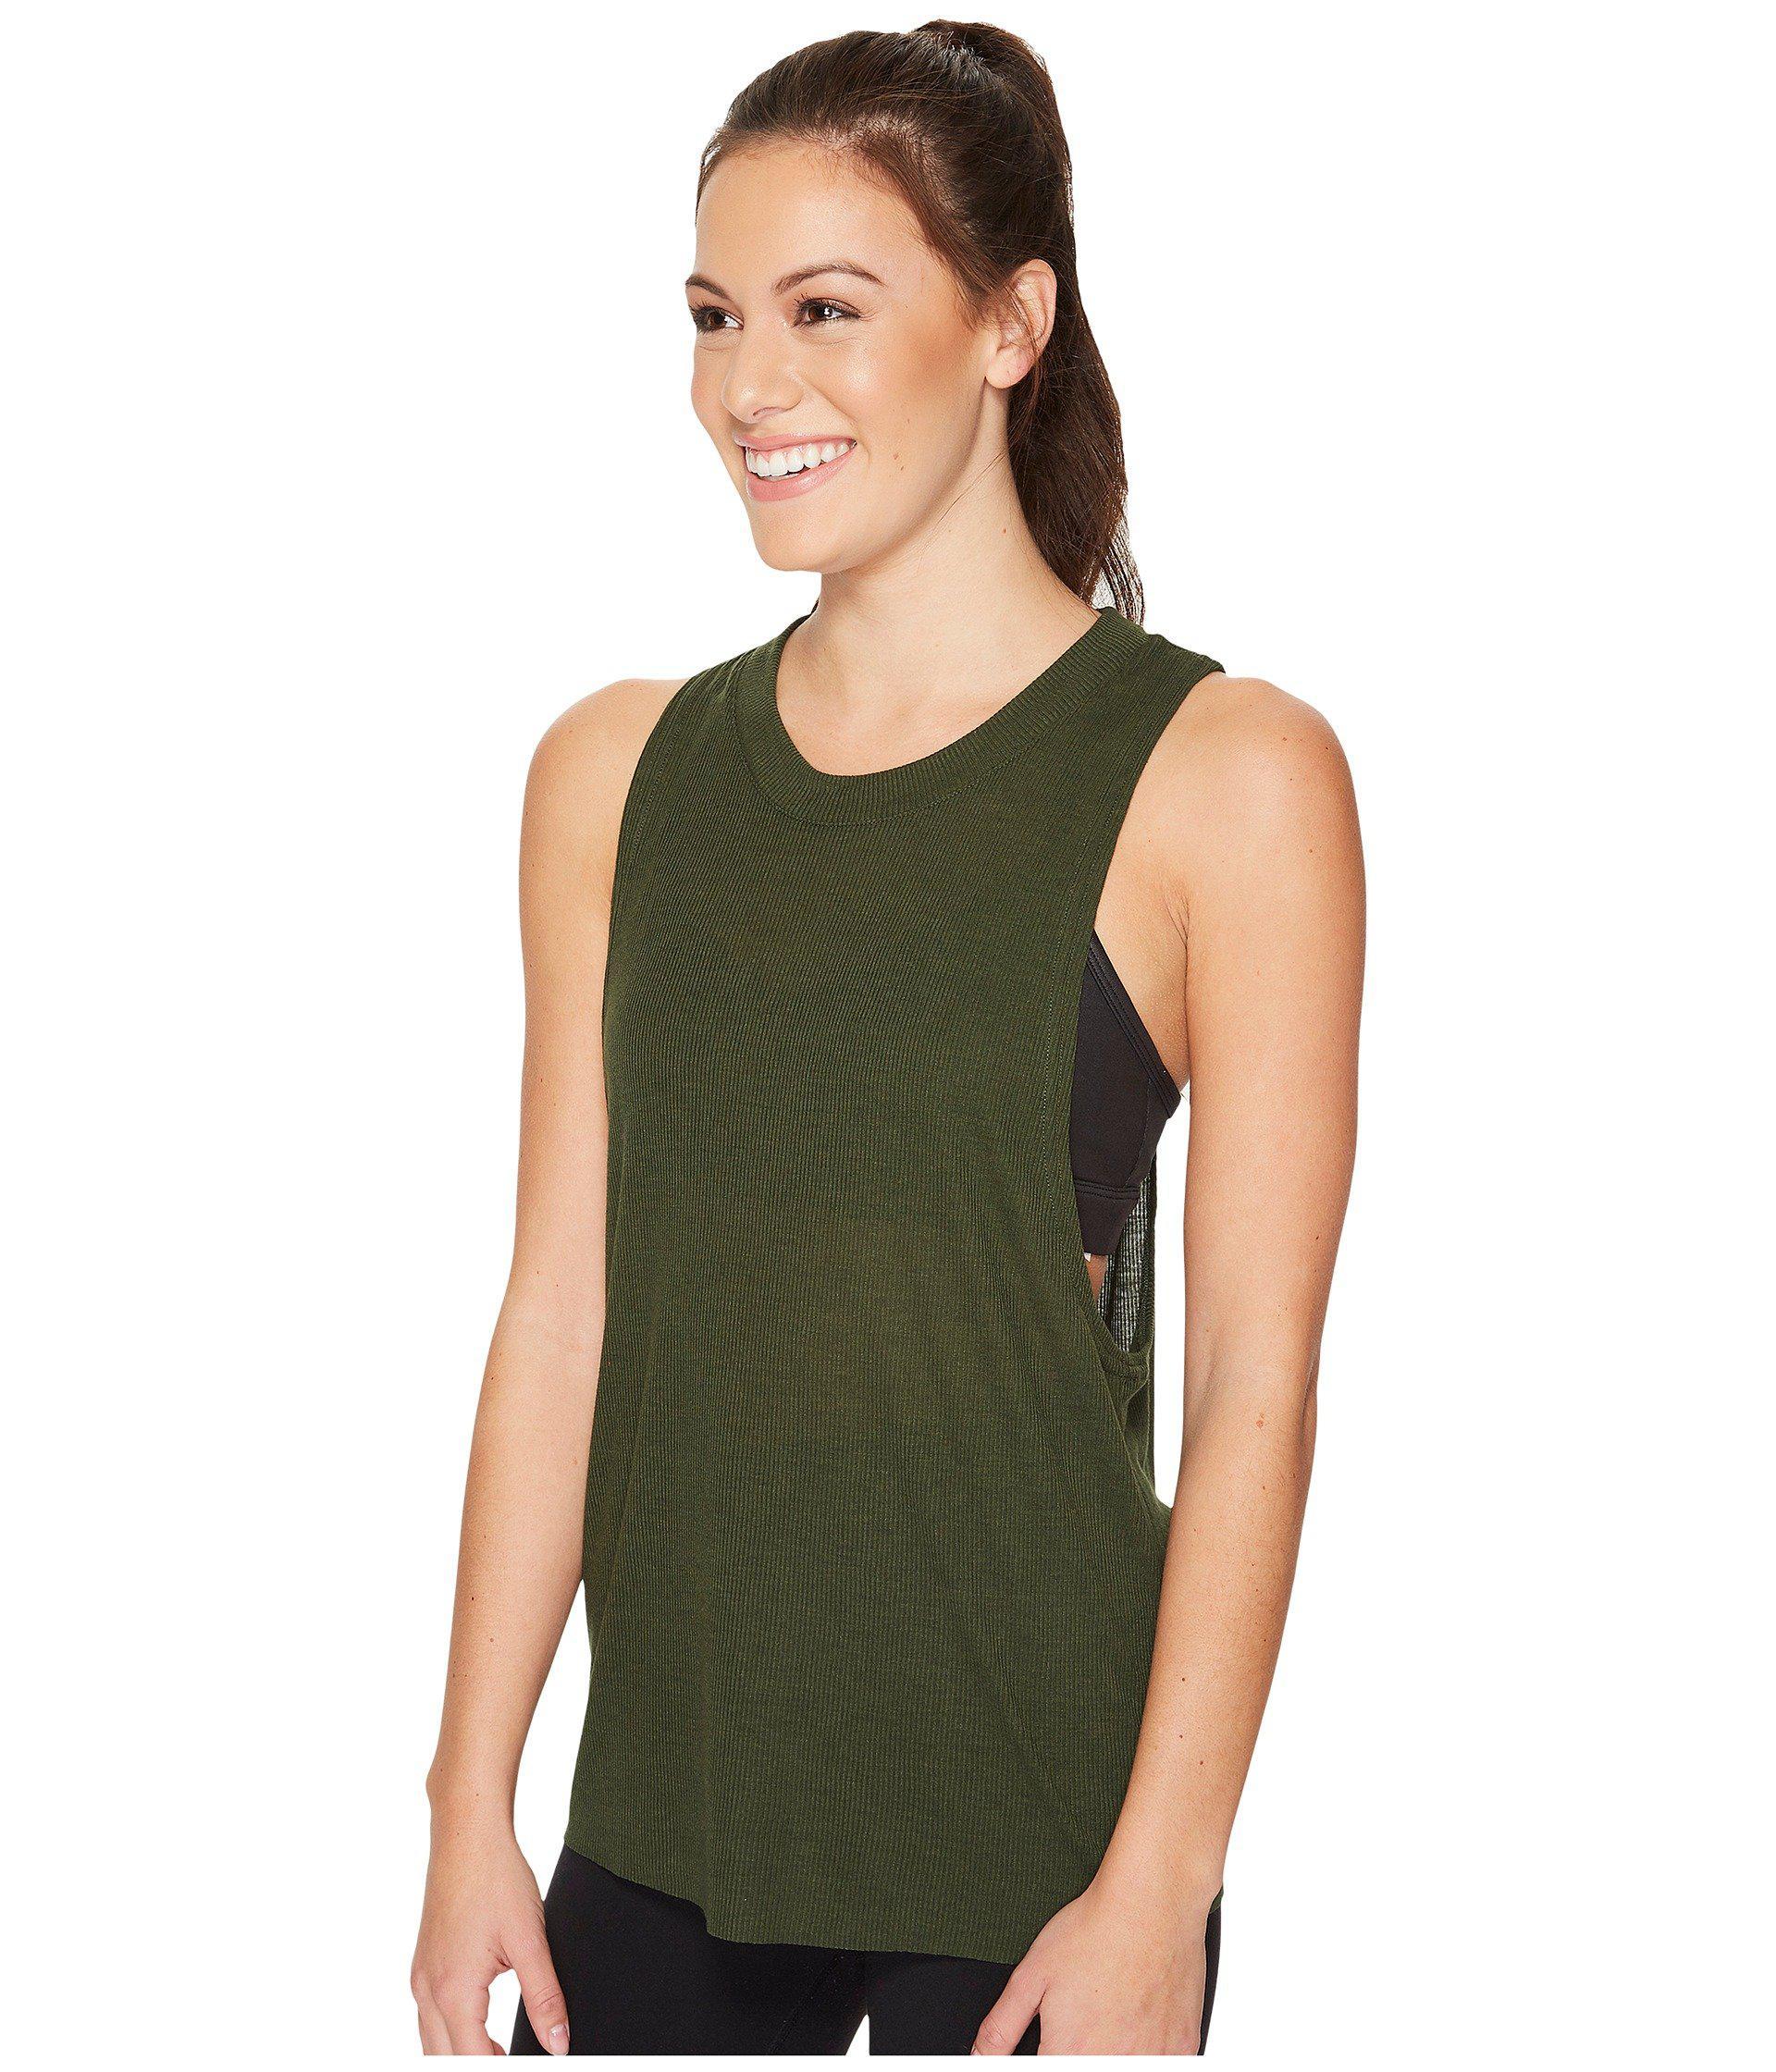 38741a6ab9ace Lyst - Alo Yoga Heat-wave Tank Top (pistachio) Women s Sleeveless in Green